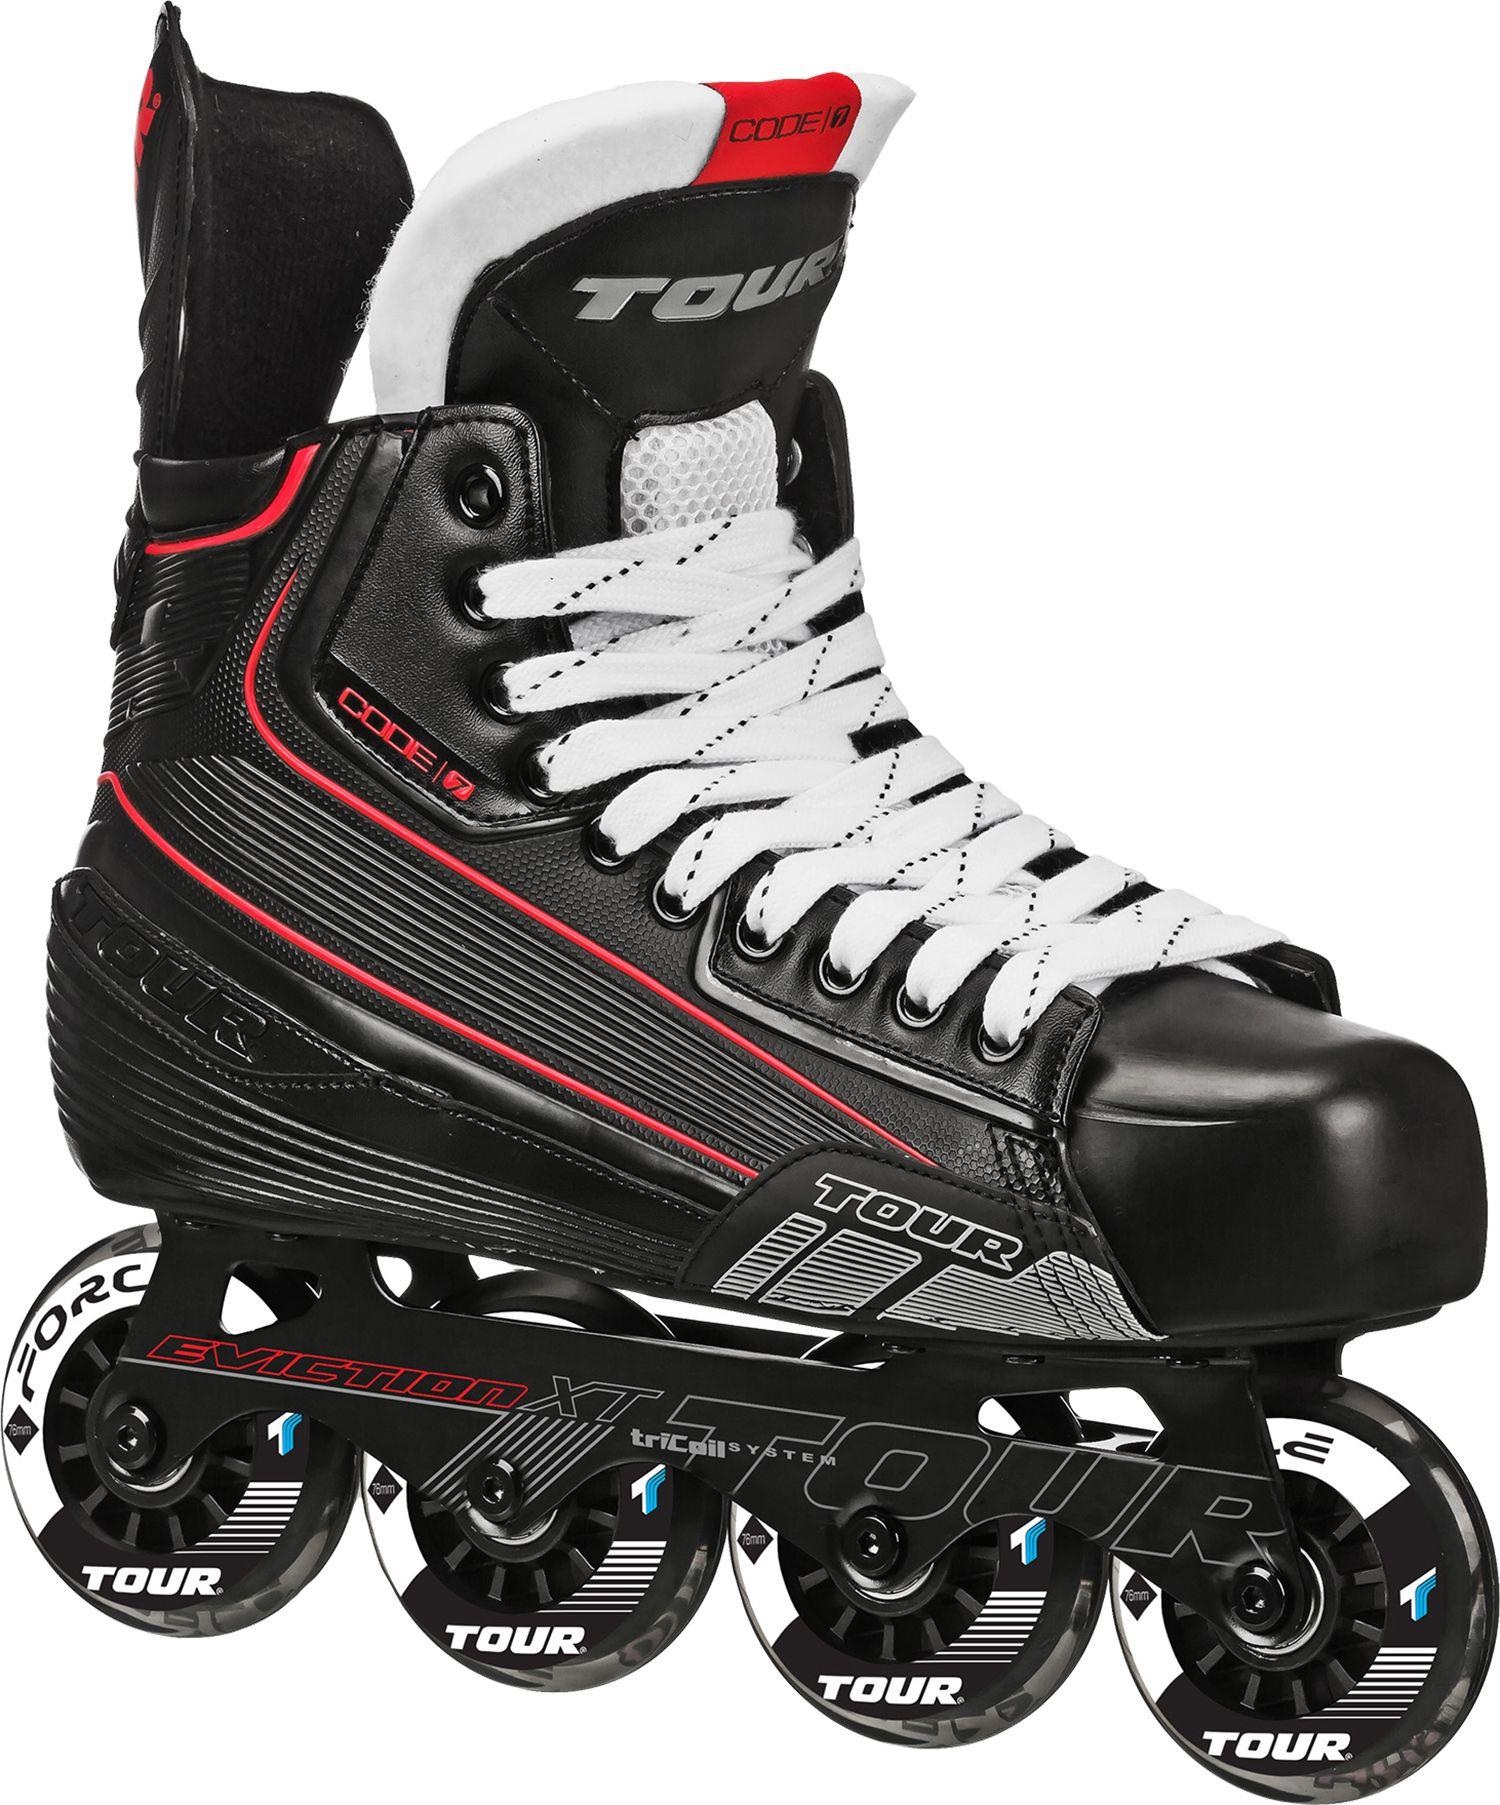 Roller skating visalia - Product Image Tour Hockey Junior Code 7 Roller Hockey Skates